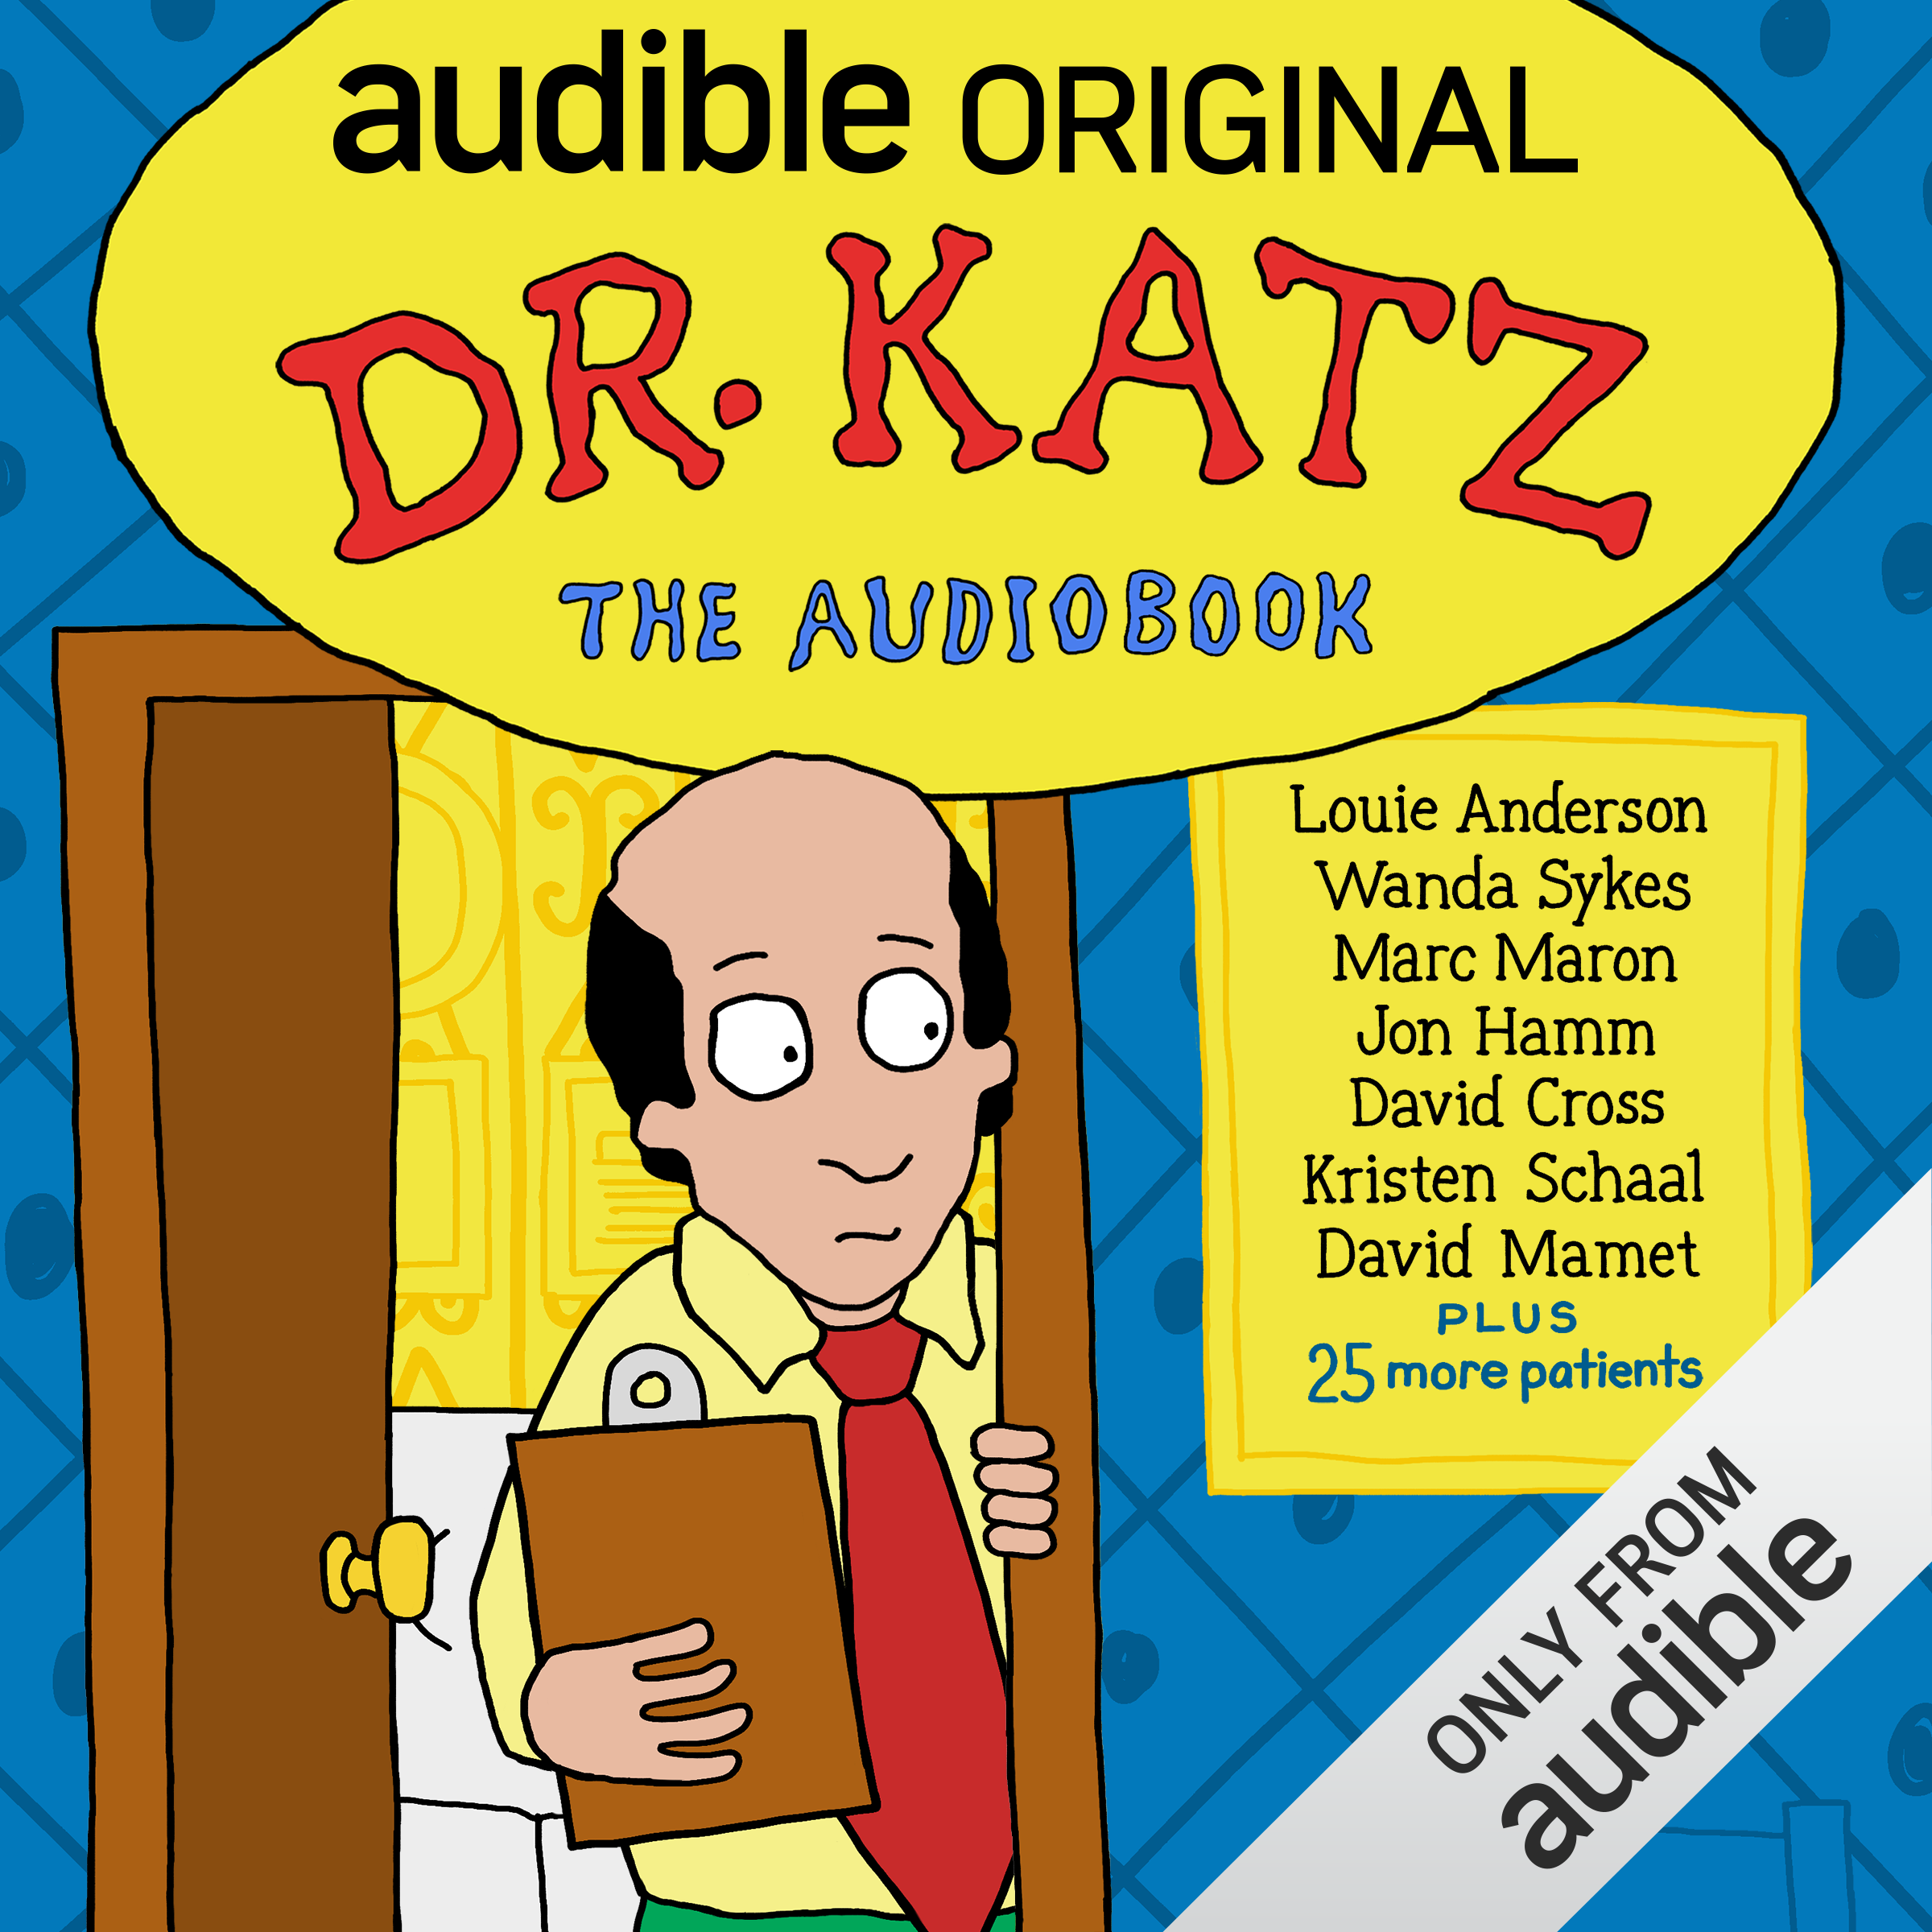 Dr. Katz: The Audiobook – Louie Anderson